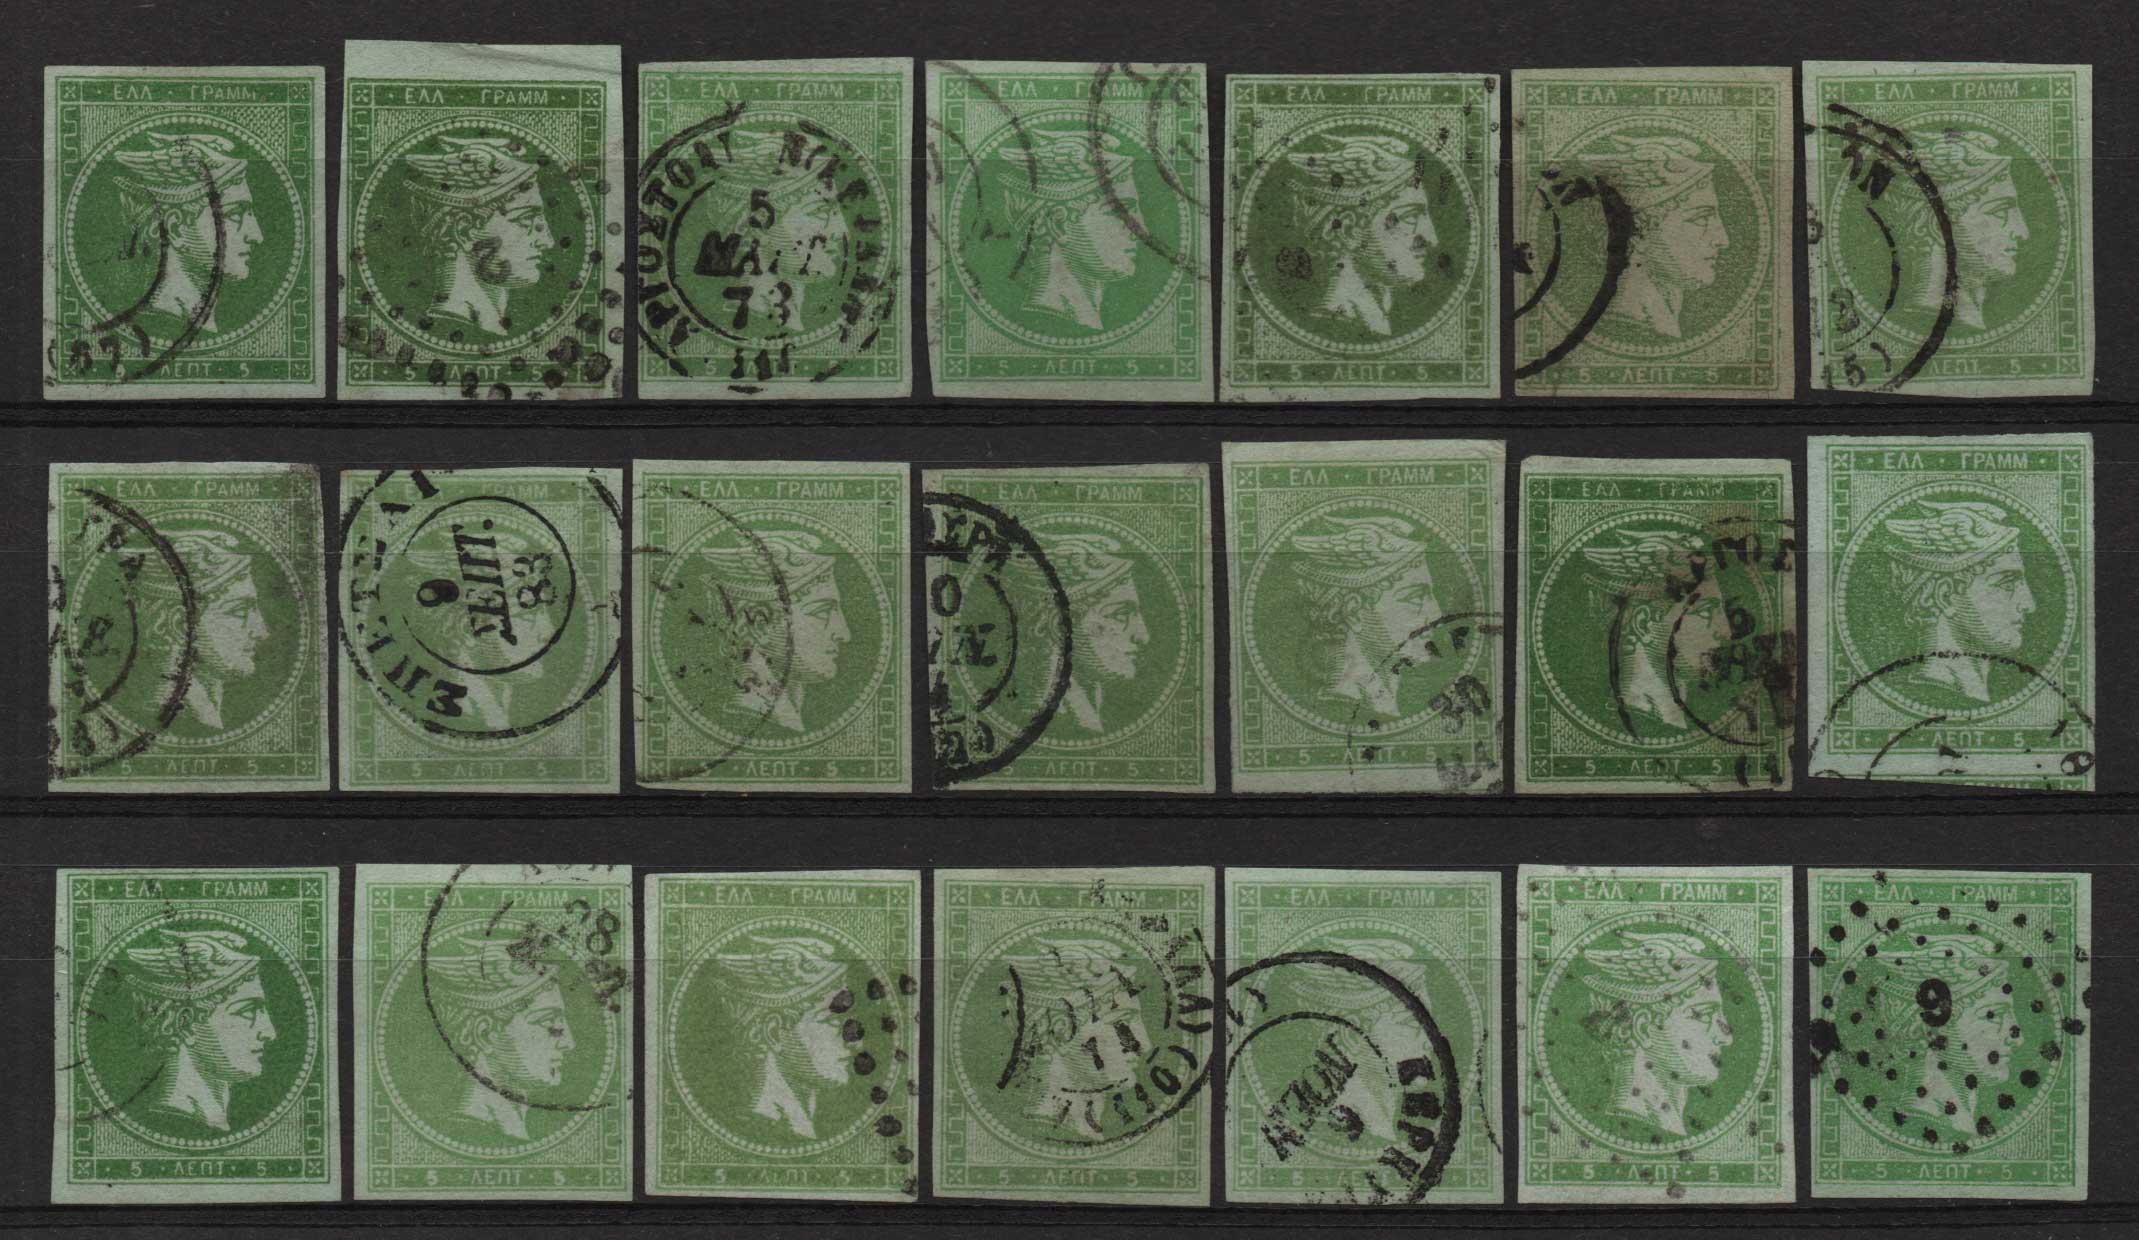 Lot 11 - -  LARGE HERMES HEAD large hermes head -  Athens Auctions Public Auction 70 General Stamp Sale